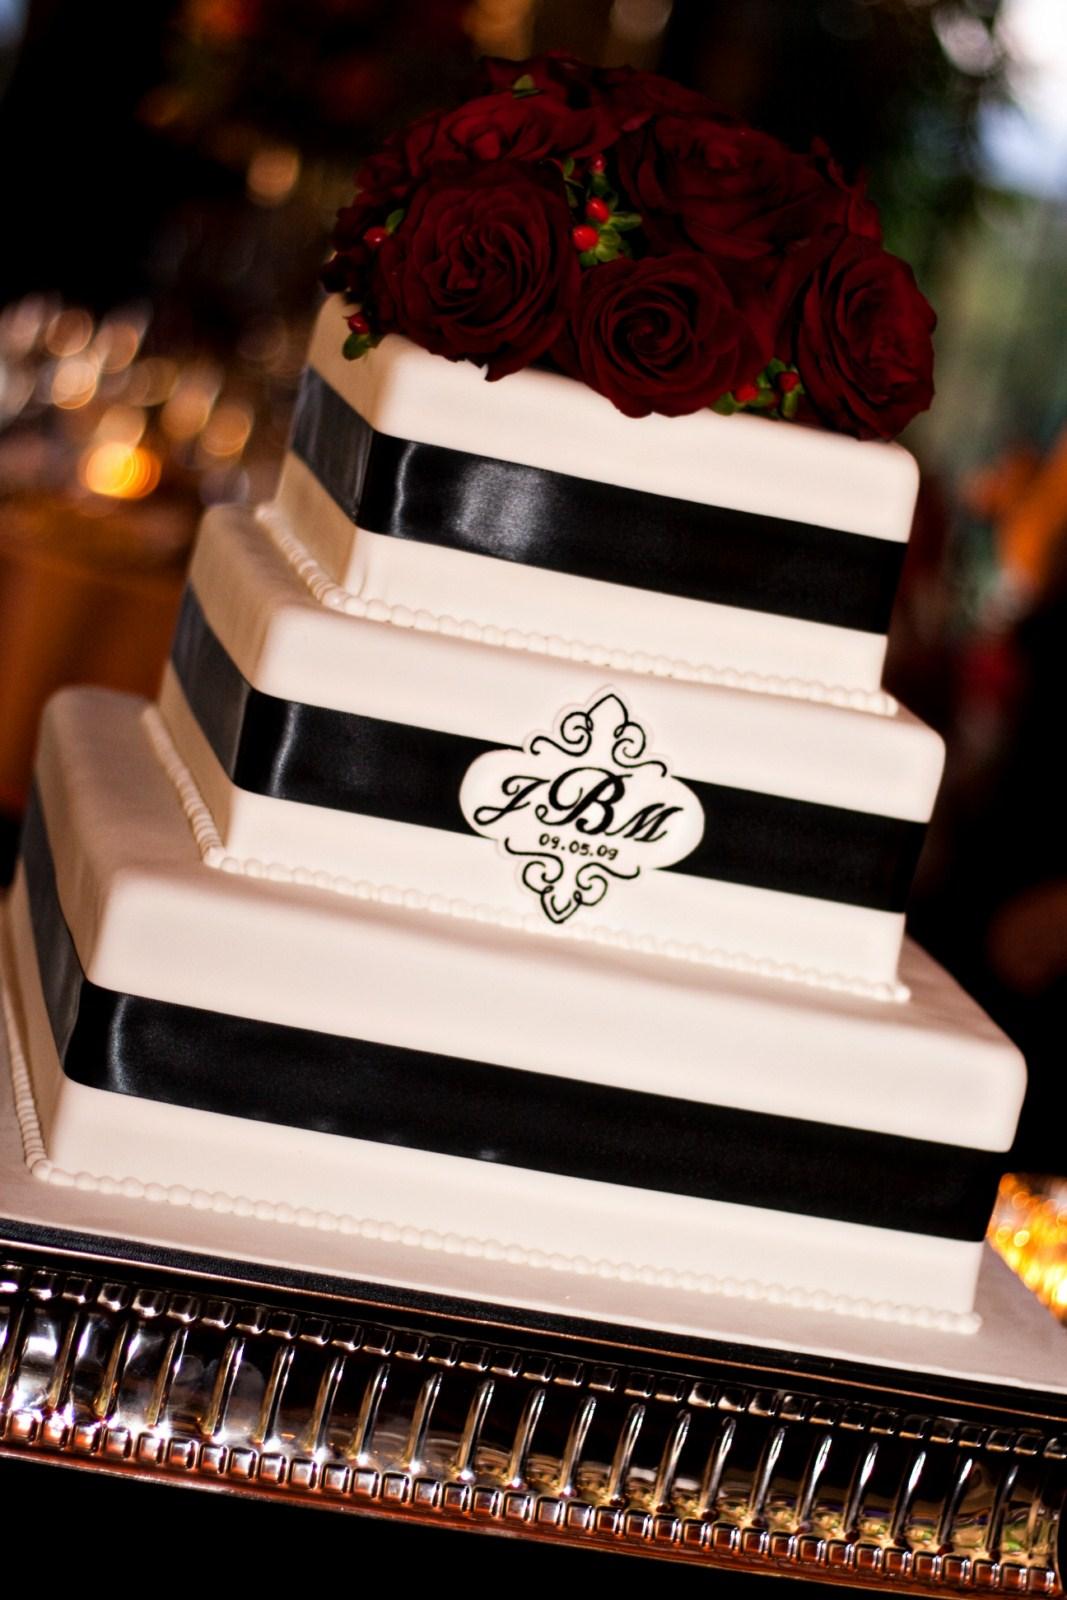 cake girls of sacramento rebecca salinas sweet cakes by rebecca. Black Bedroom Furniture Sets. Home Design Ideas